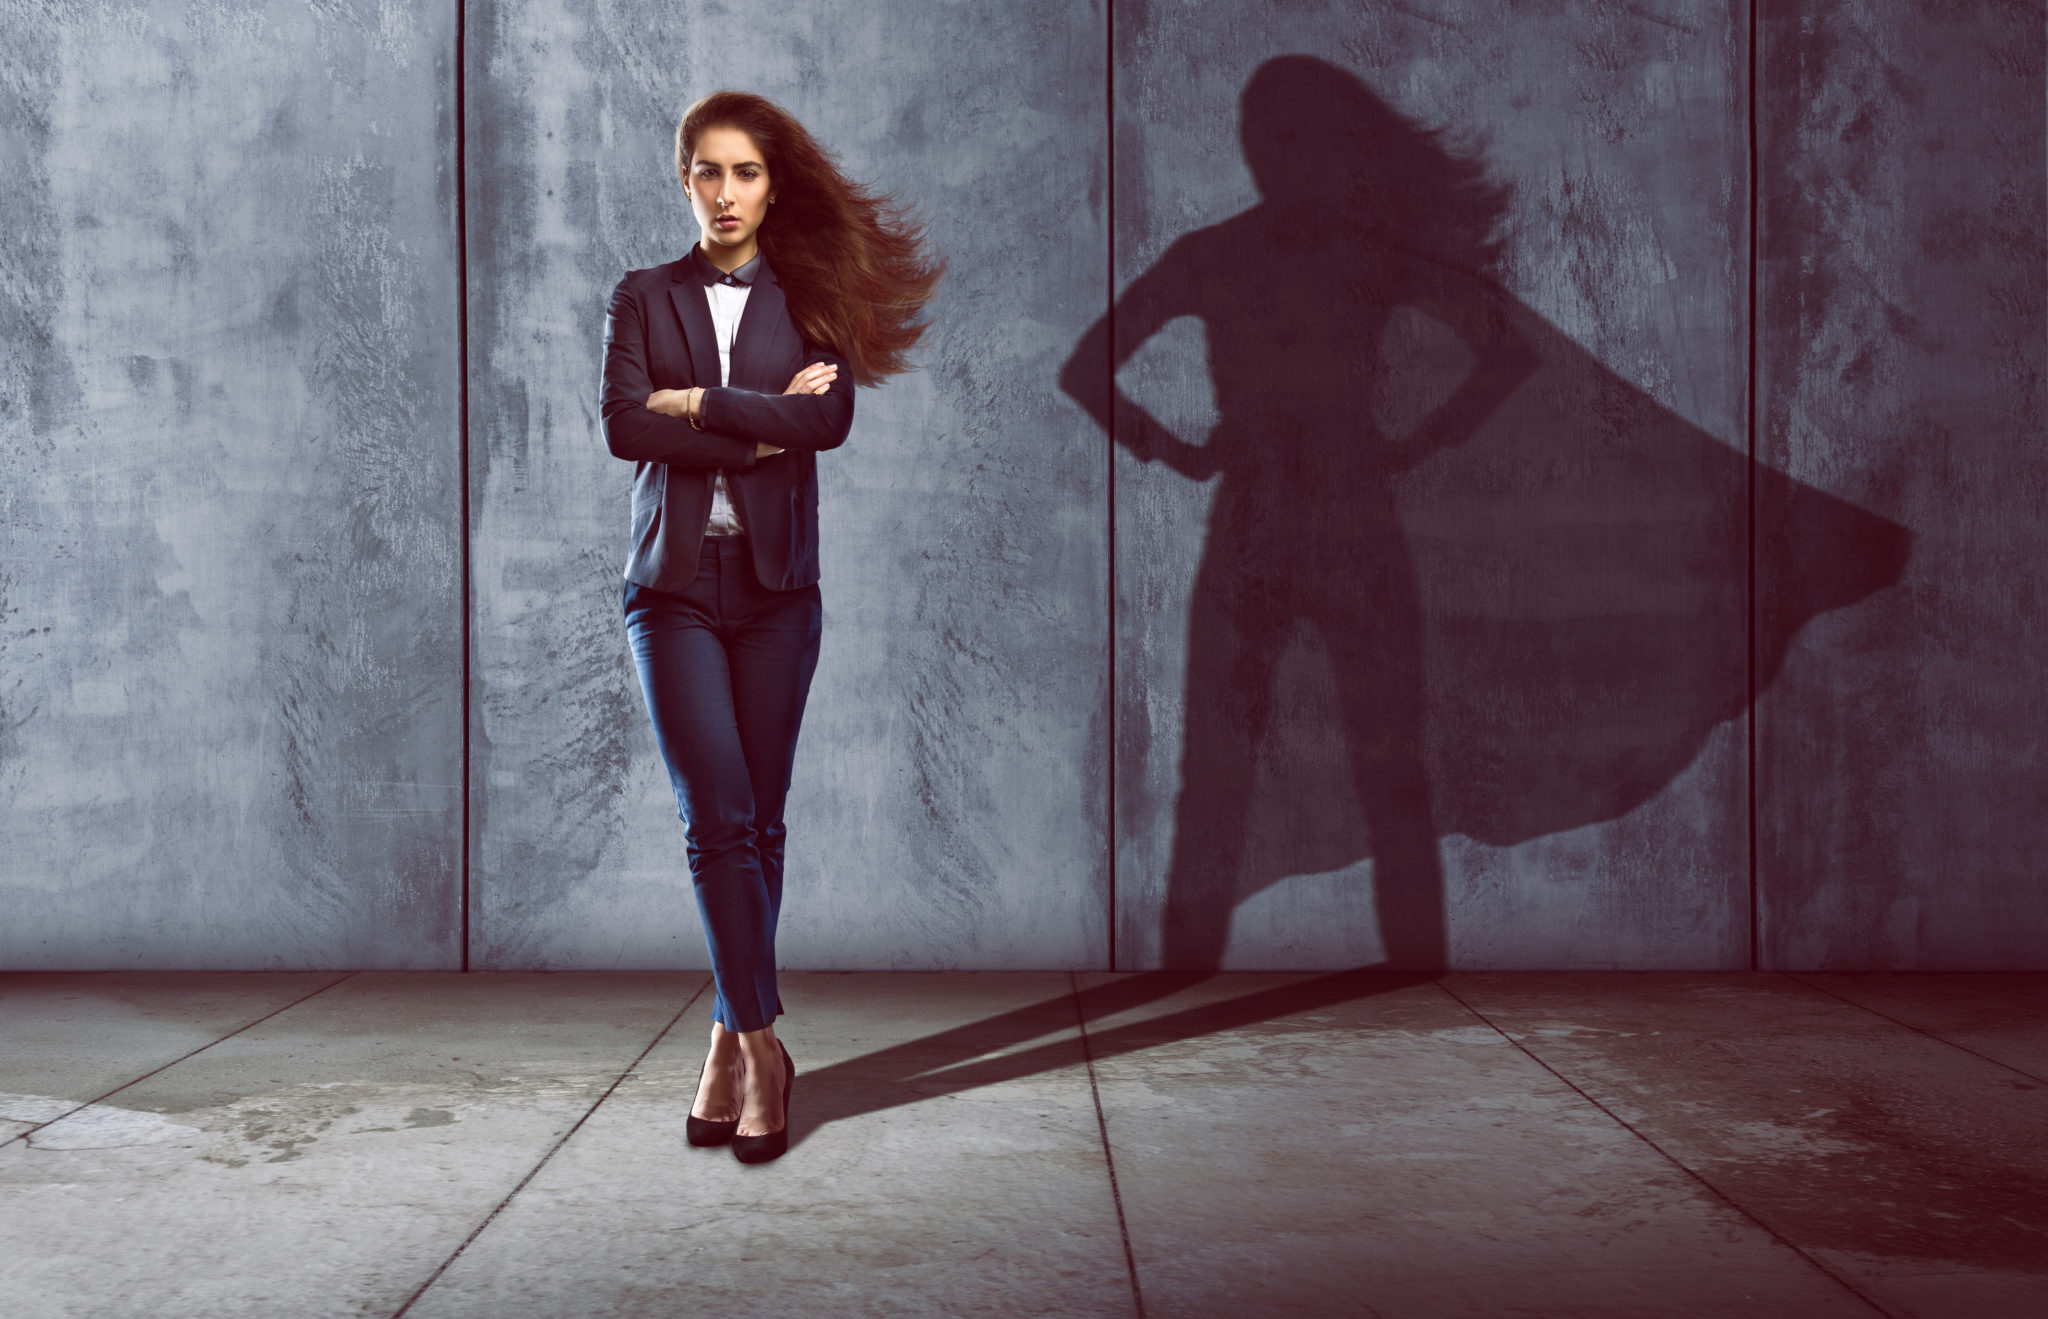 confident-woman.jpg